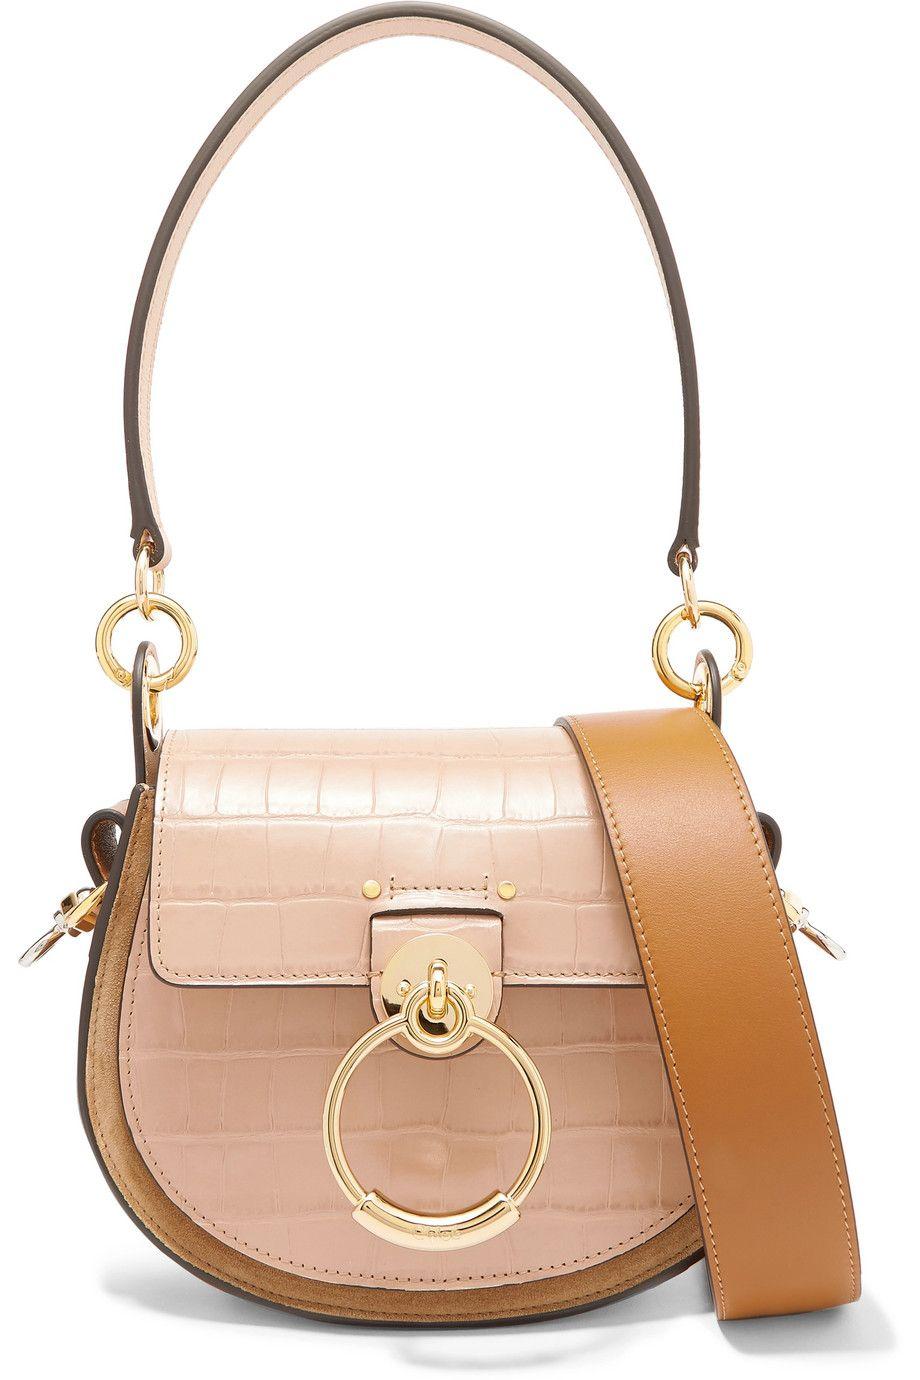 c205777e4310cc CHLOÉ Tess small croc-effect leather and suede shoulder bag - gold  hardware, light pink crocodile skin, shoulder bag, cross body bag